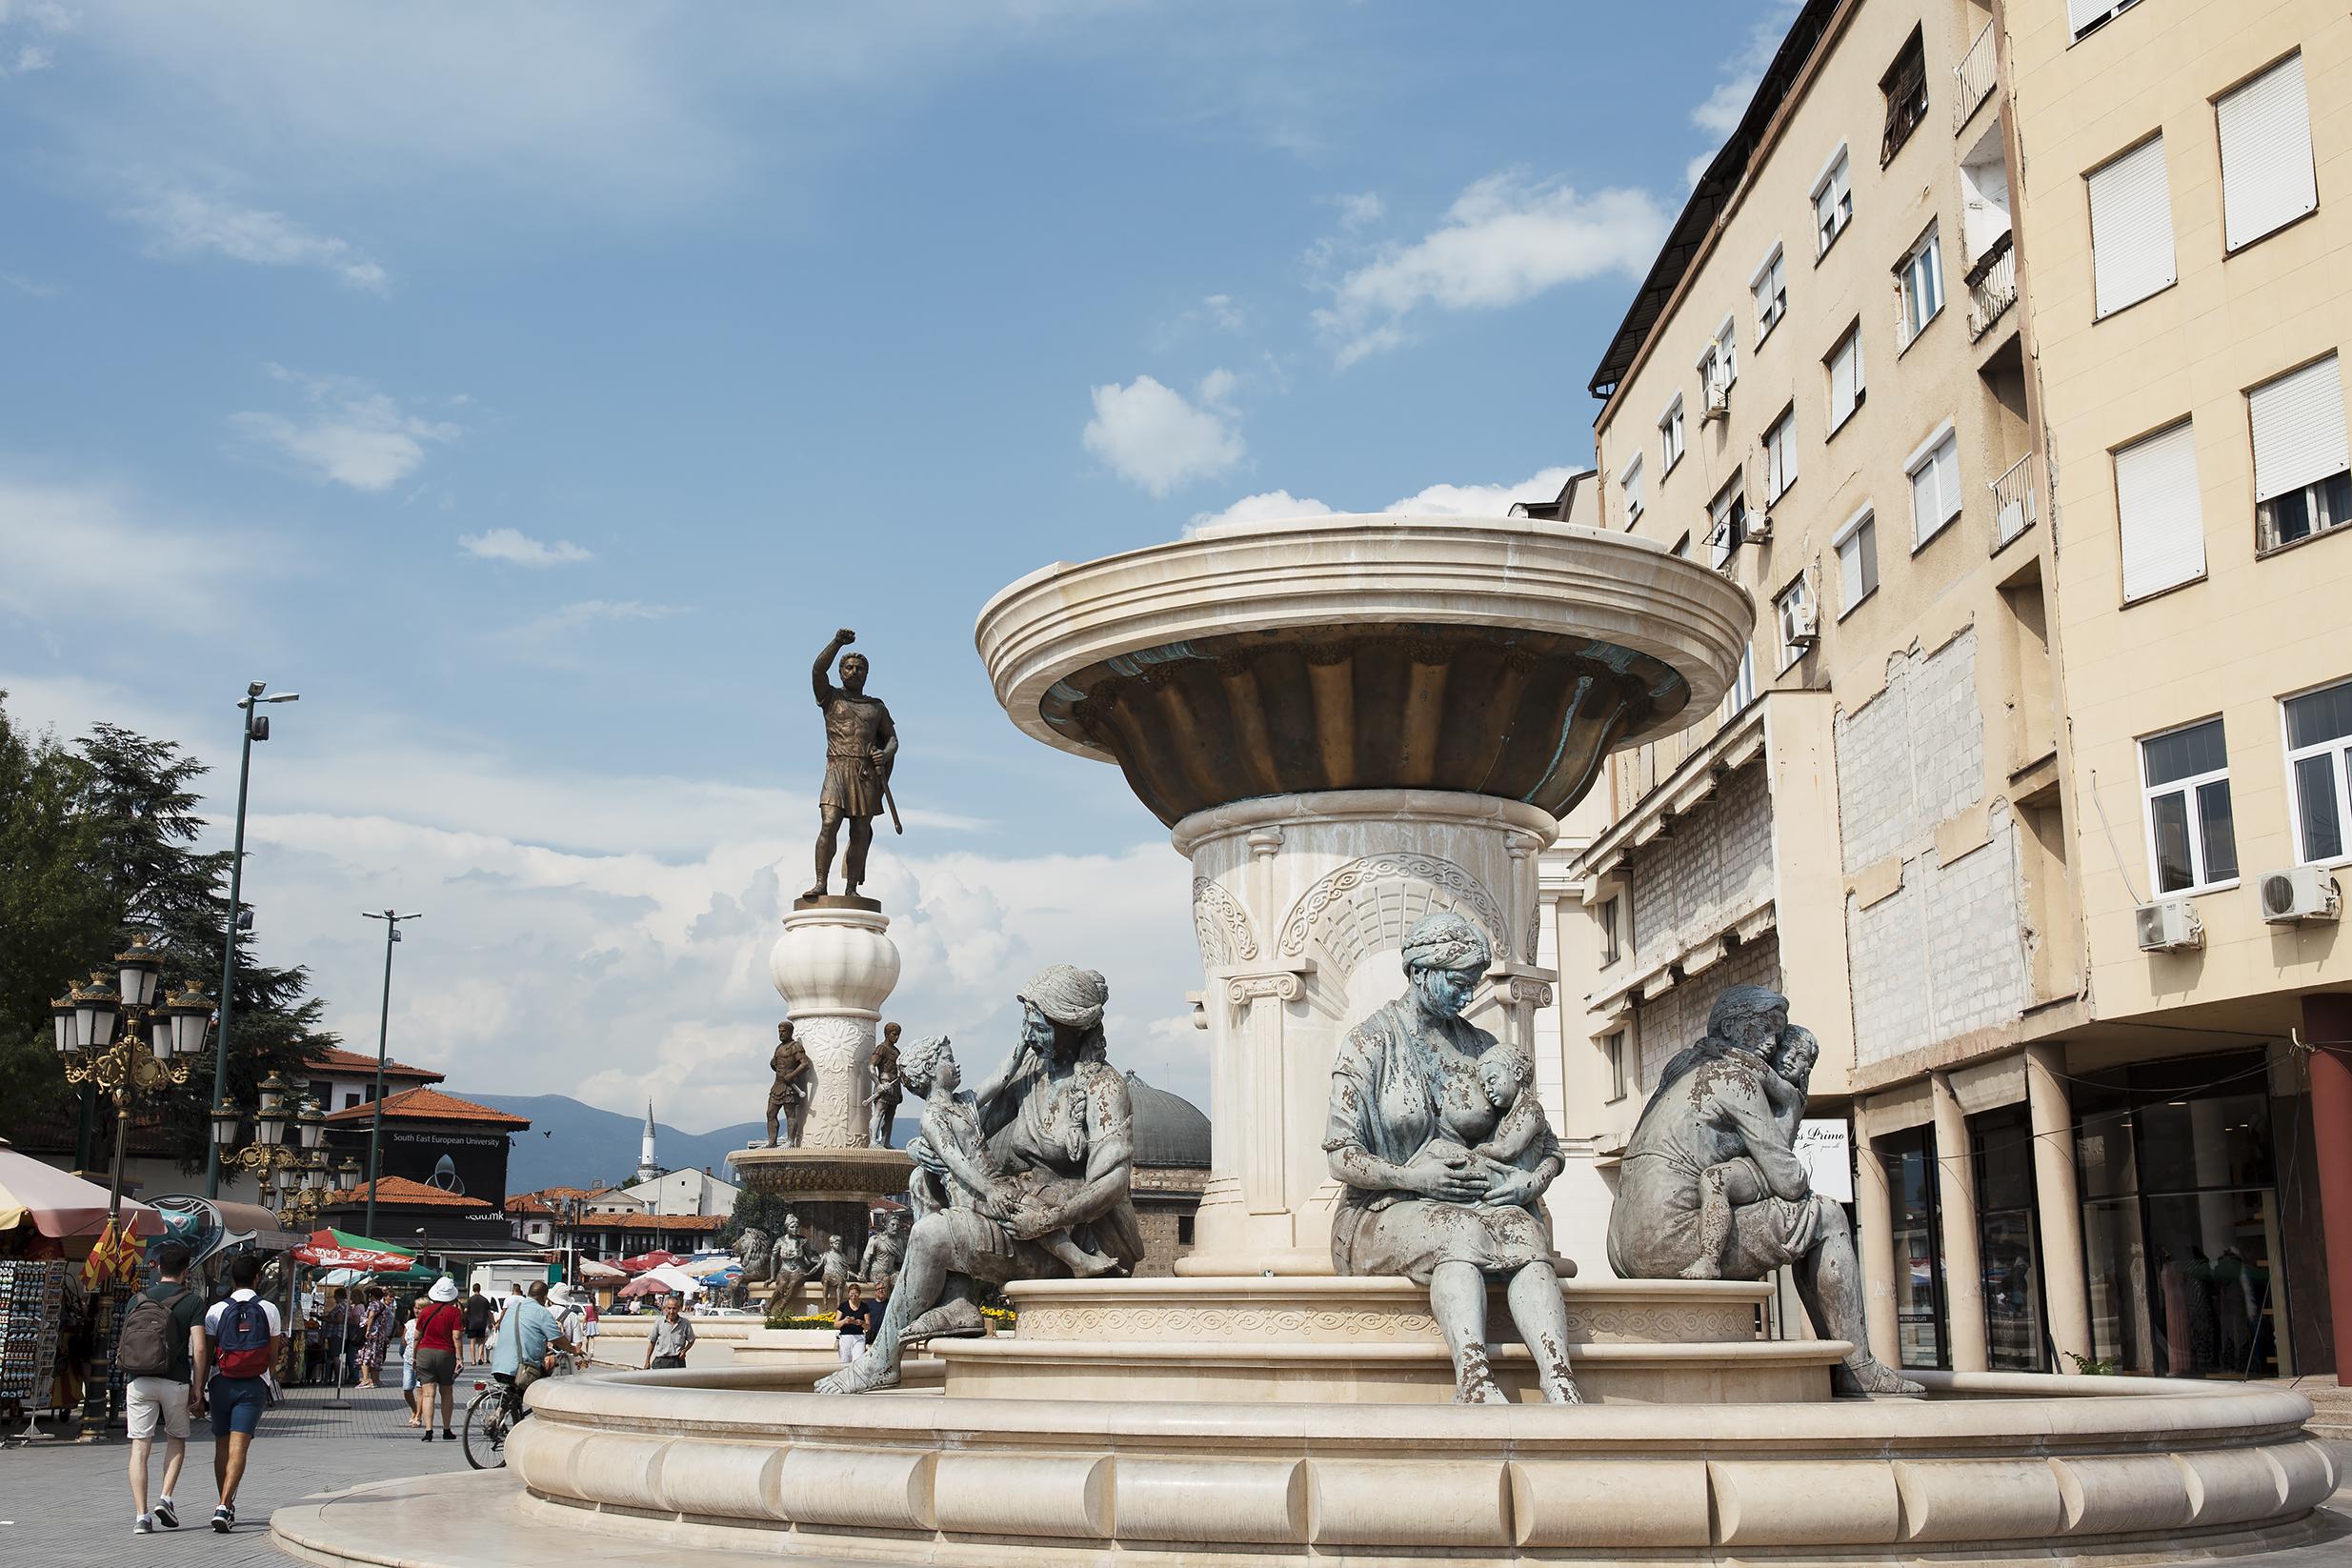 chrissihernandez-north-macedonia-skopje (18)copy3000.jpg